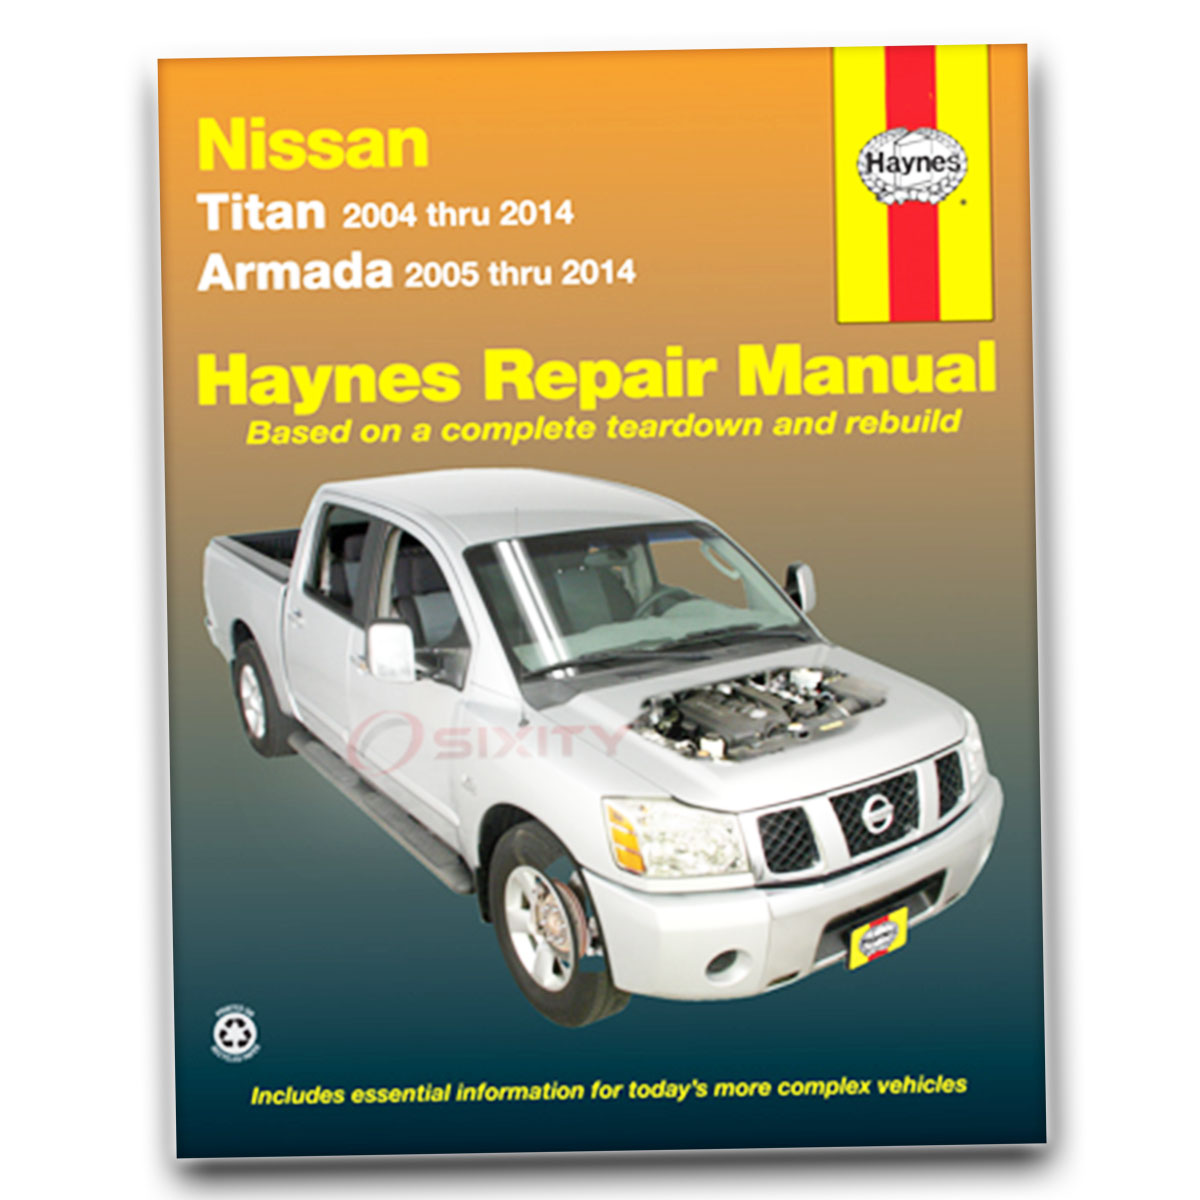 nissan titan haynes repair manual xe se le pro 4x shop service rh ebay com 2008 Nissan Titan nissan titan manual door unlock